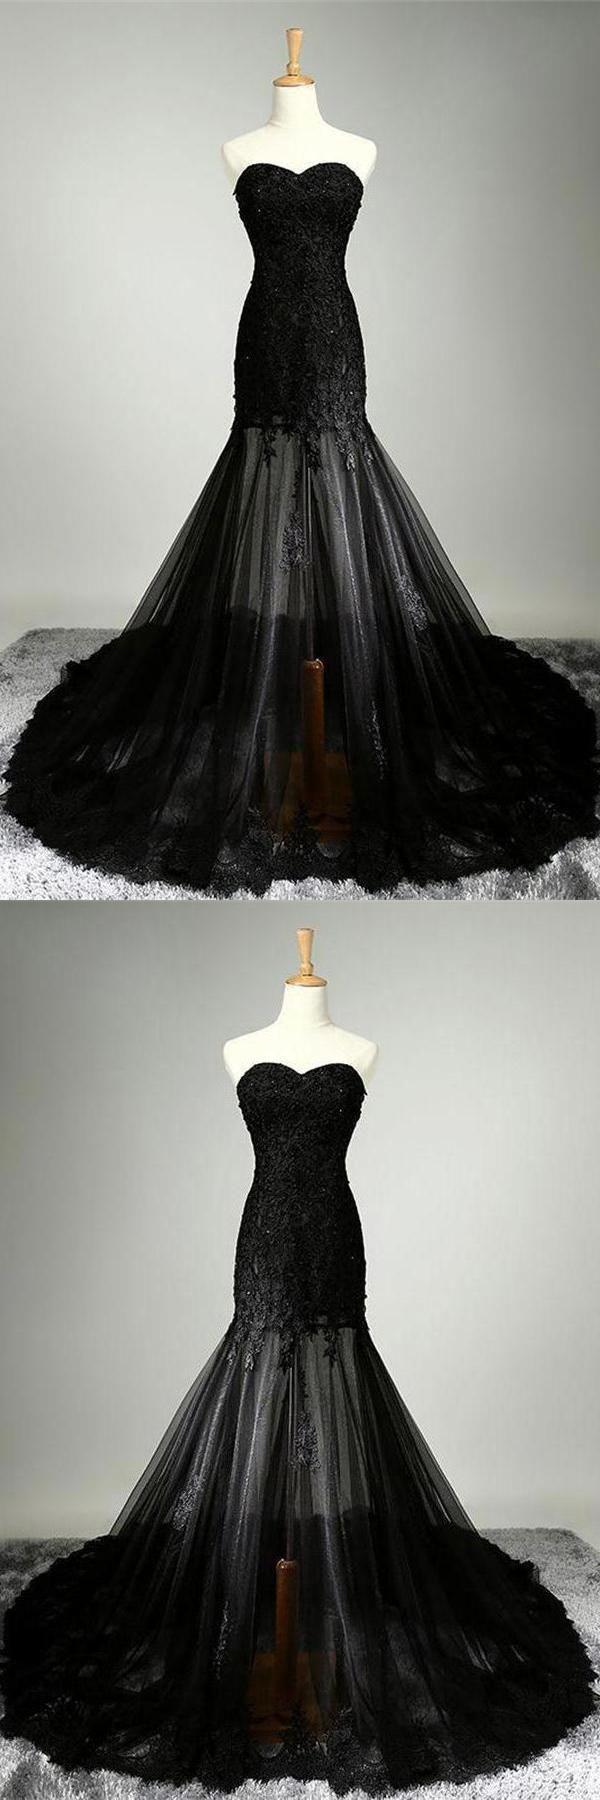 Prom dresses lace black mermaid prom dresses black lace prom